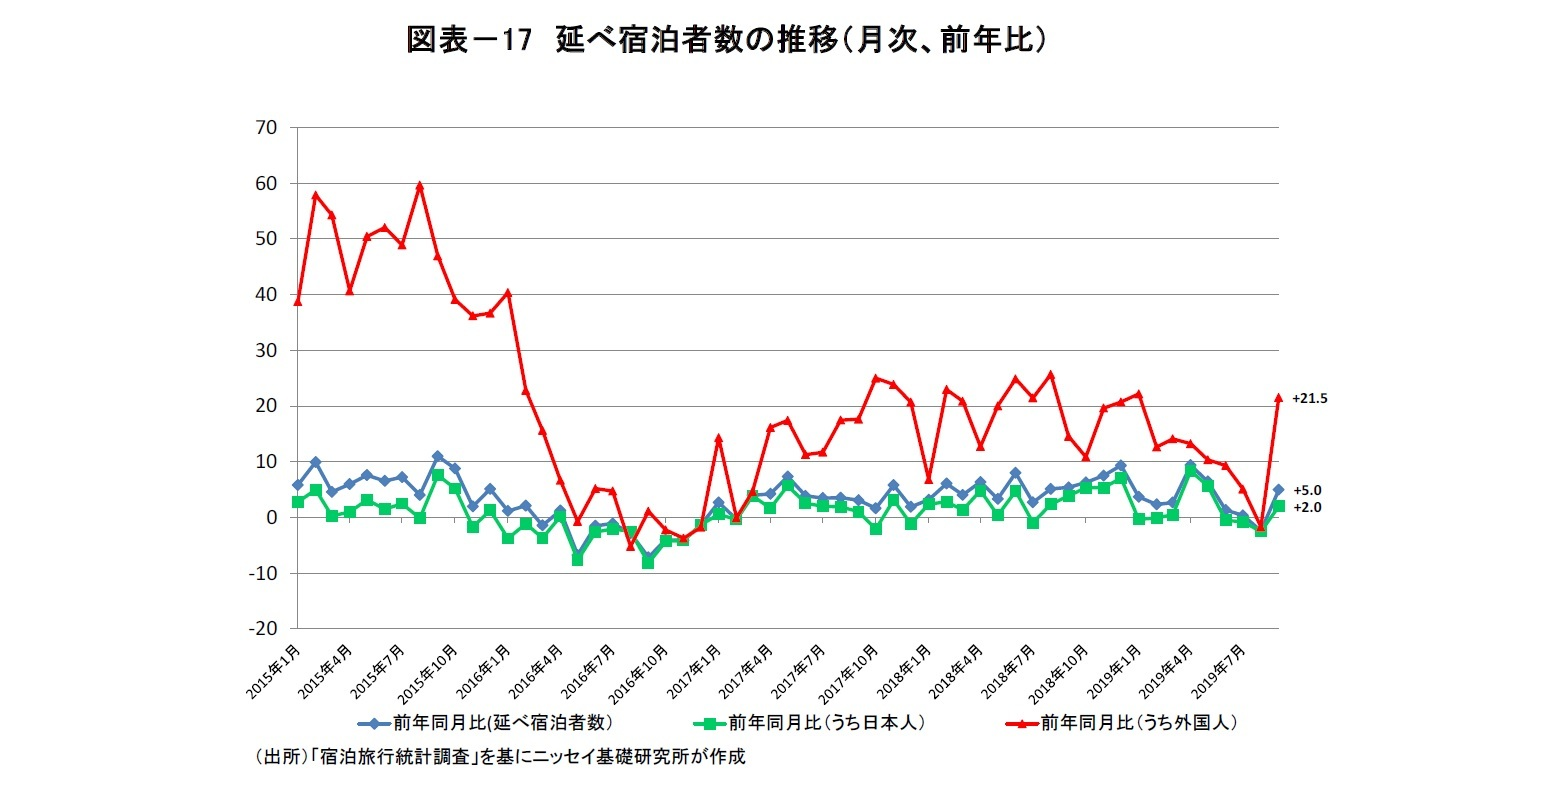 図表-17 延べ宿泊者数の推移(月次、前年比)